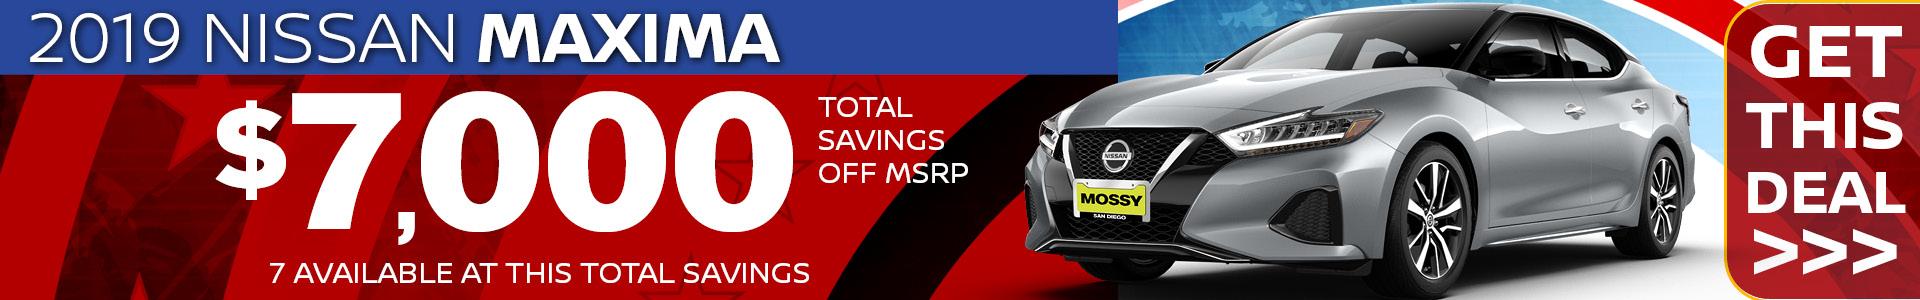 Mossy Nissan - Maxima SRP